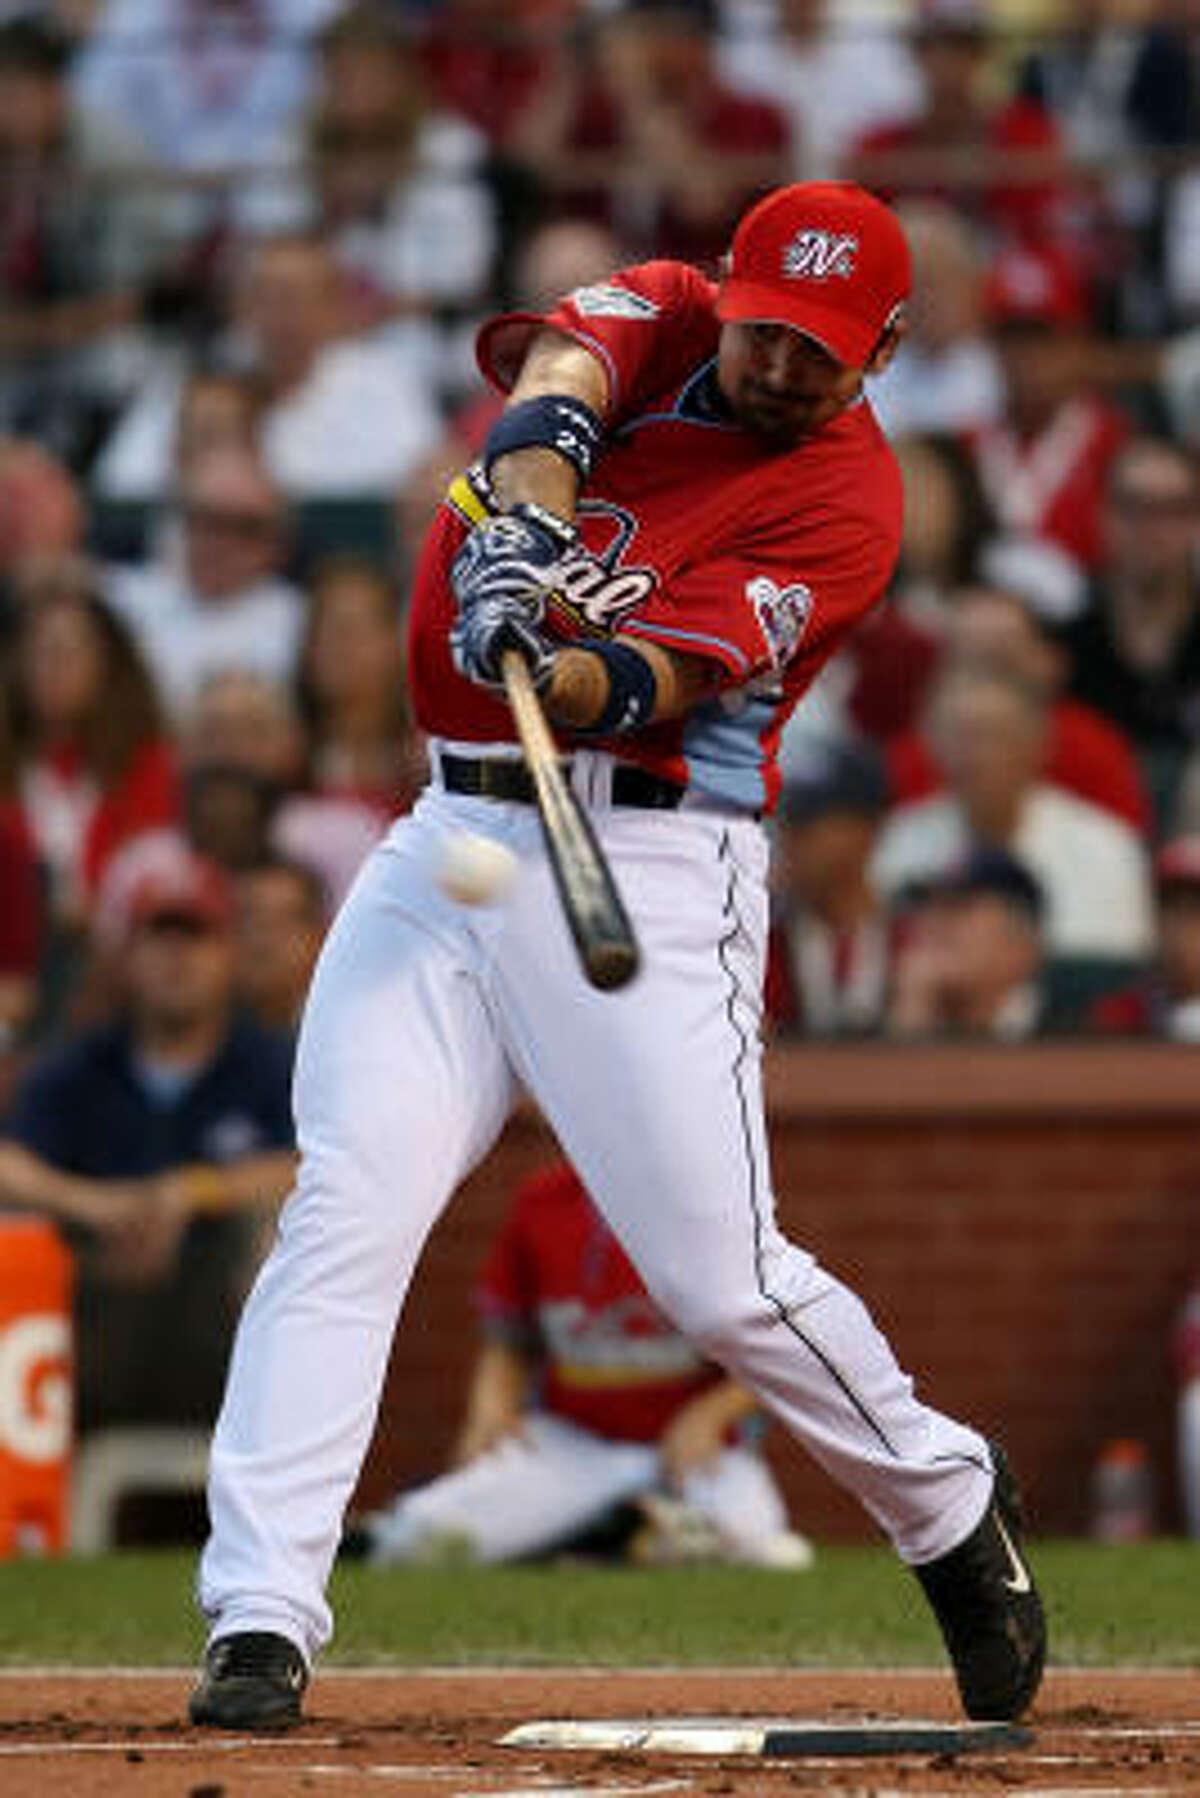 Padres first baseman Adrian Gonzalez: 2 HR